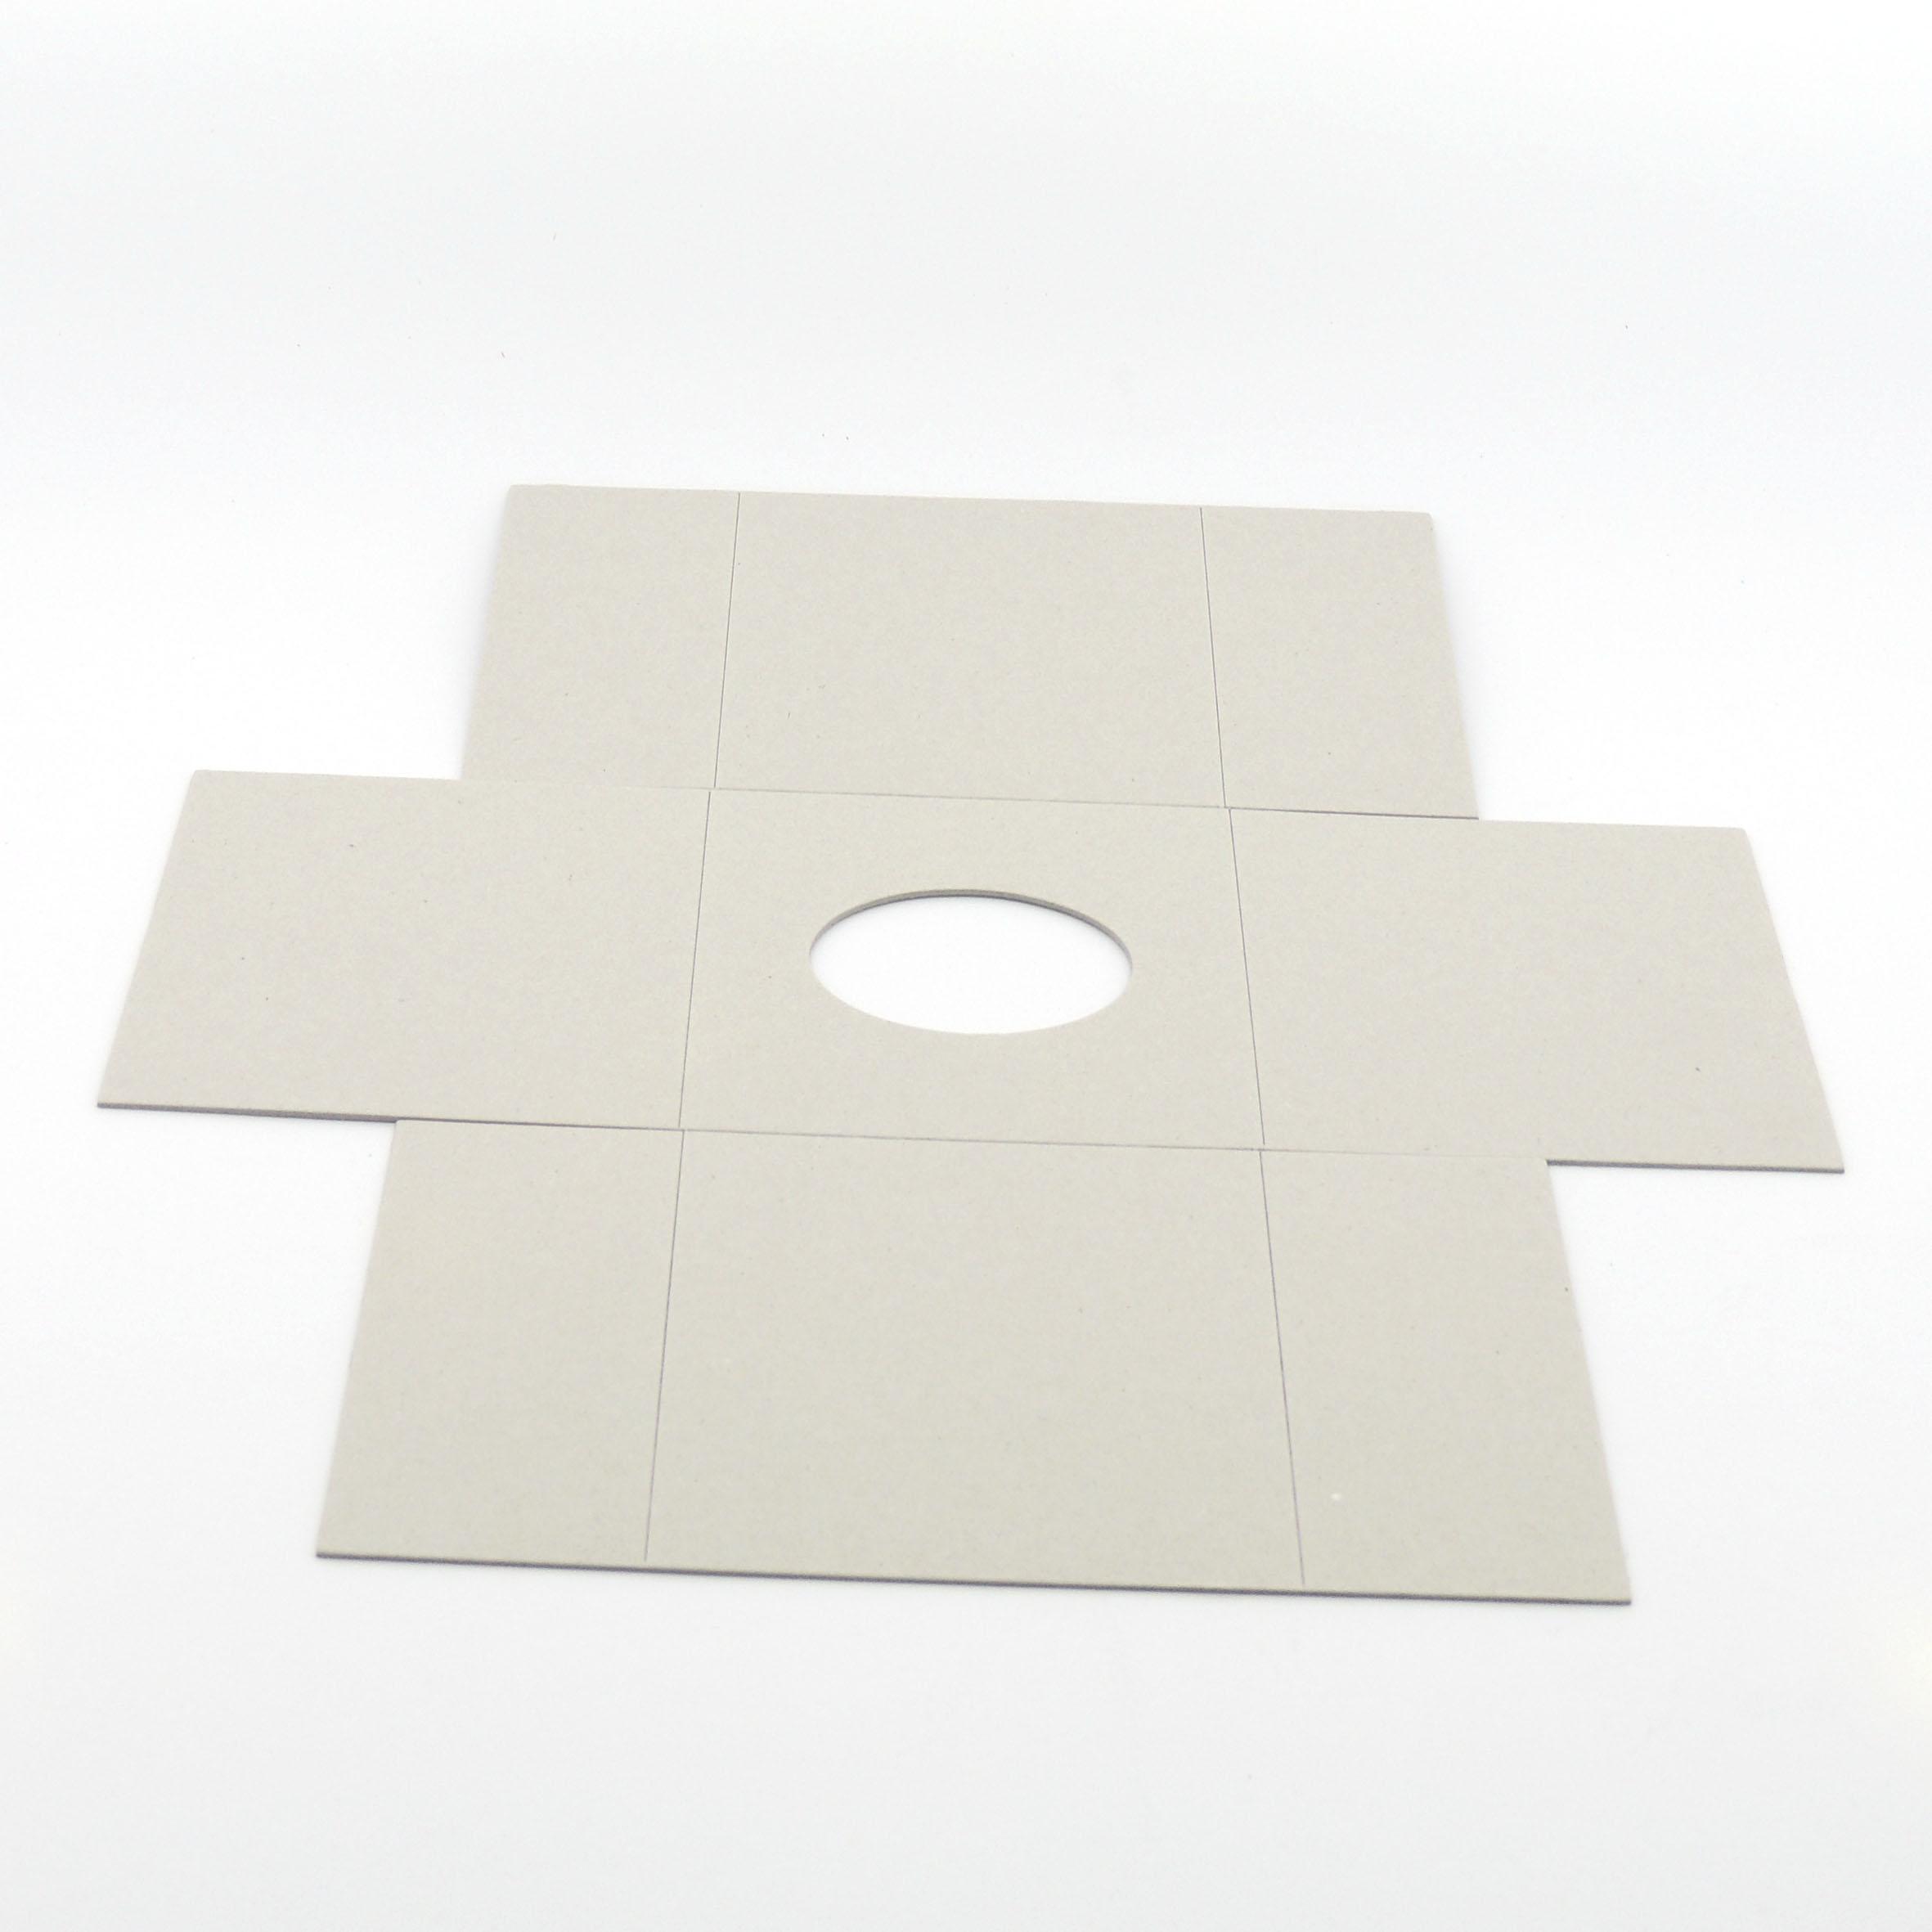 Fehr GmbH Bastelbedarf Seilerei - Kleenexboxen